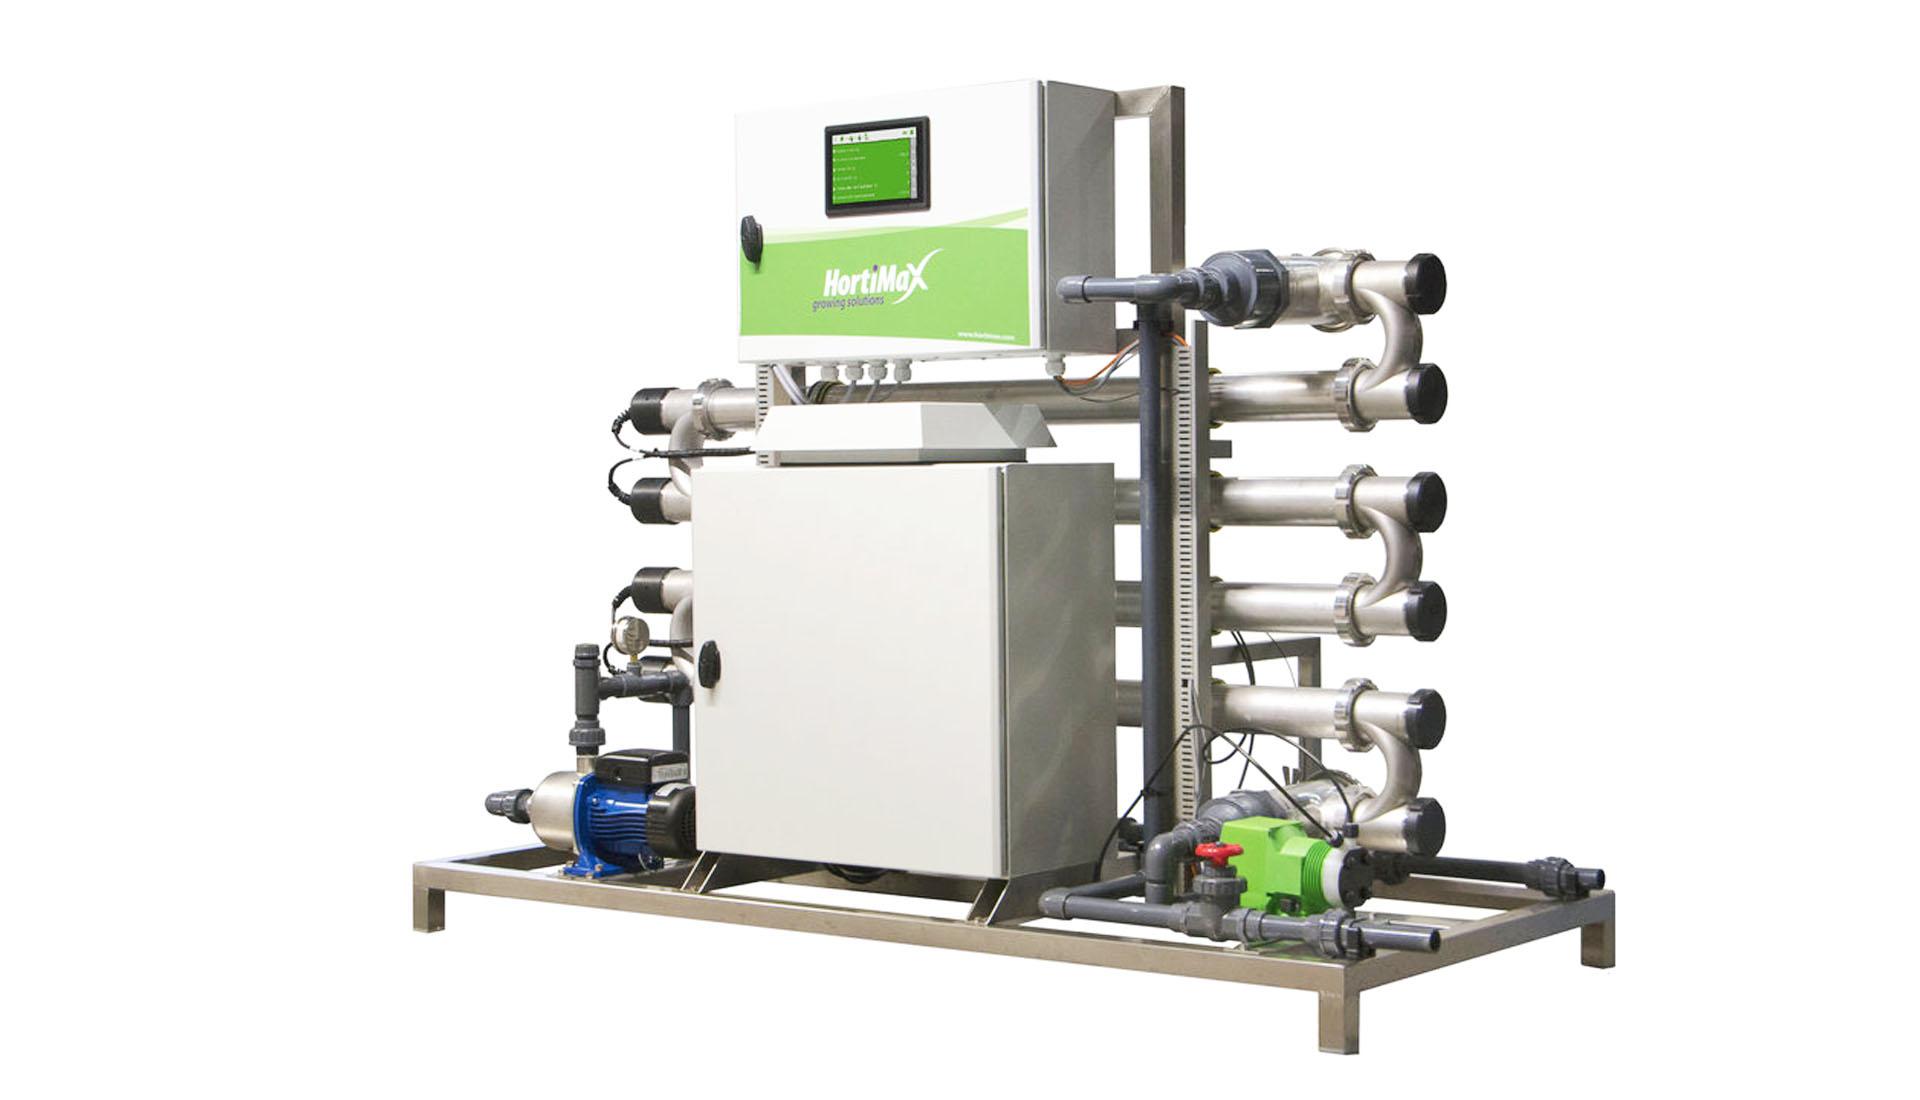 HortiMaX-cleanLite-zuiveringsplicht-elektrotechniek